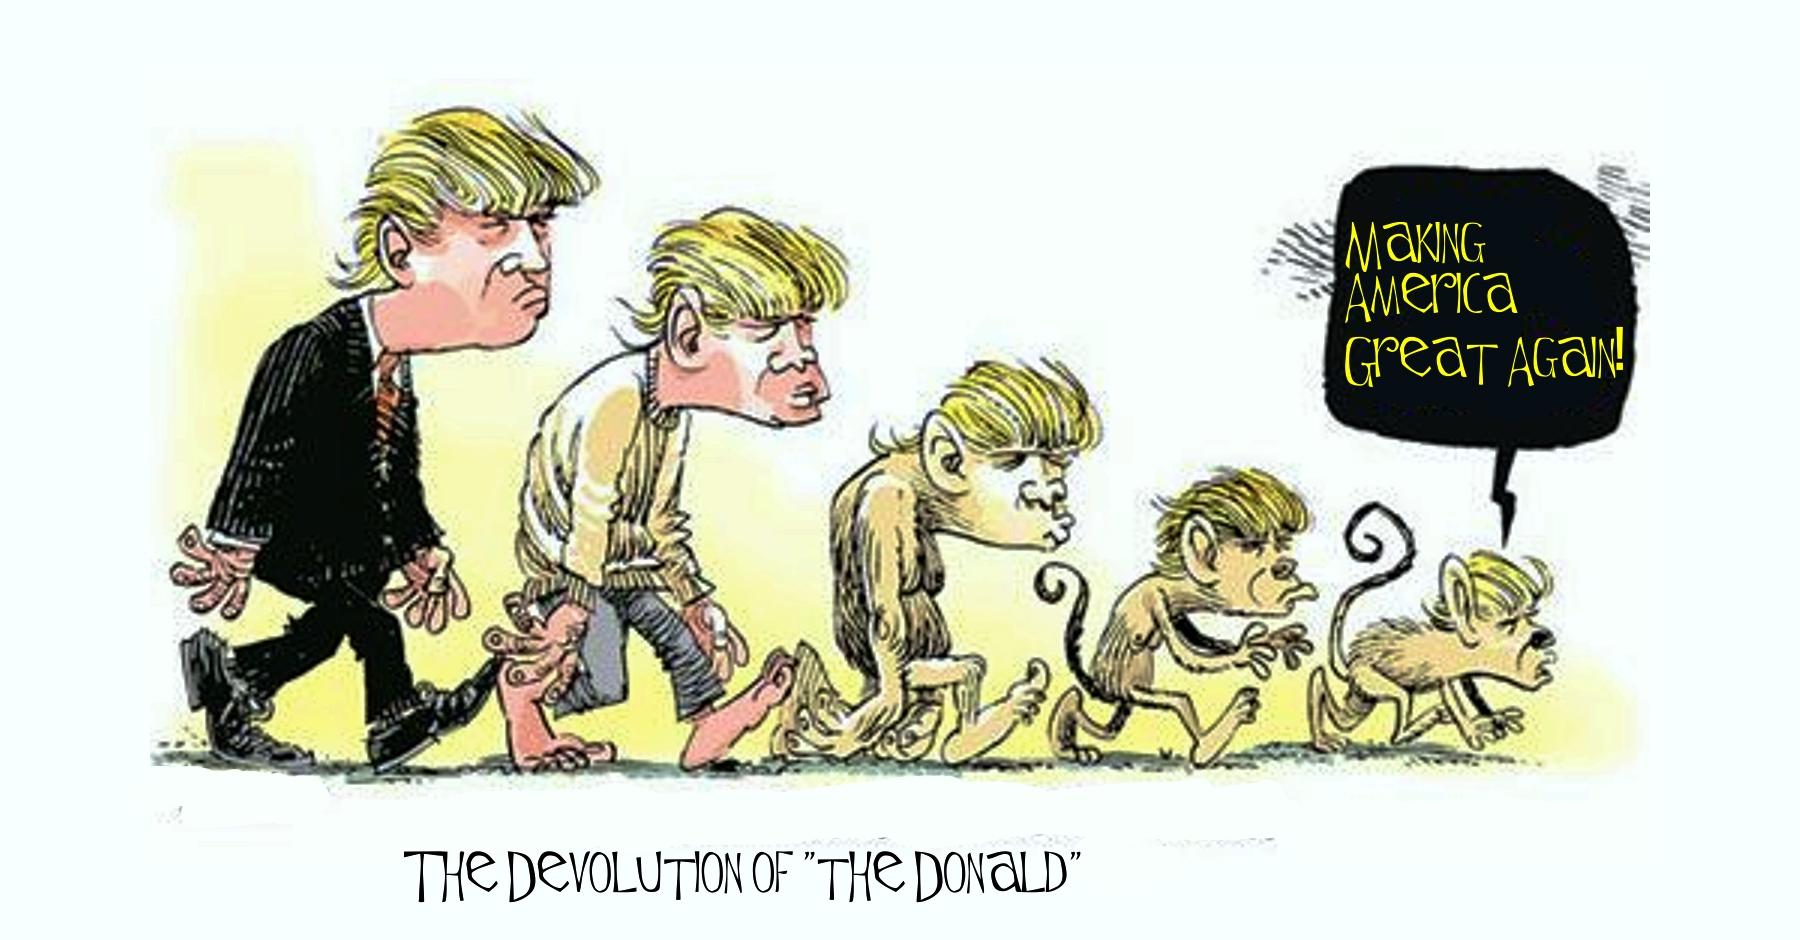 Trump for President